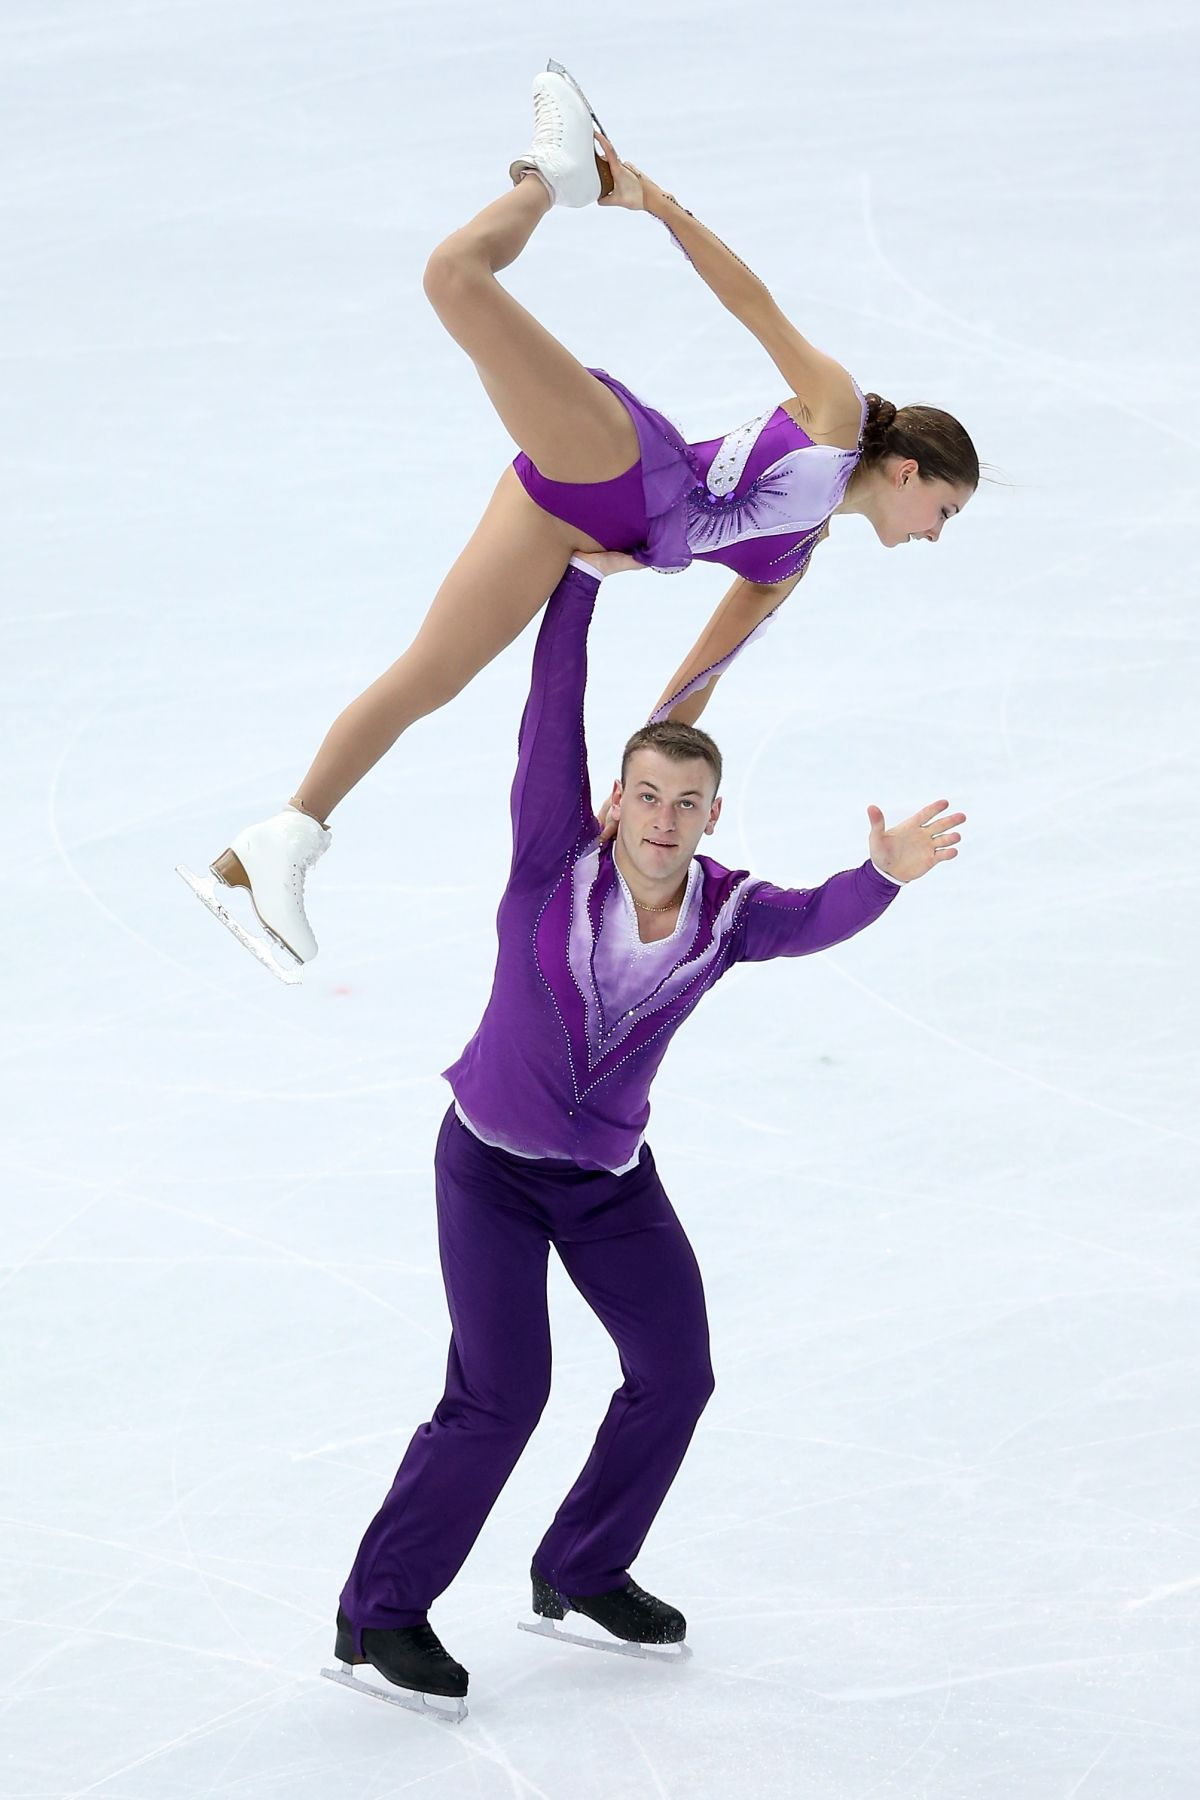 ANDREA DAVIDOVICH and Evgeni Krasnopolski at 2014 Winter Olympics in Sochi